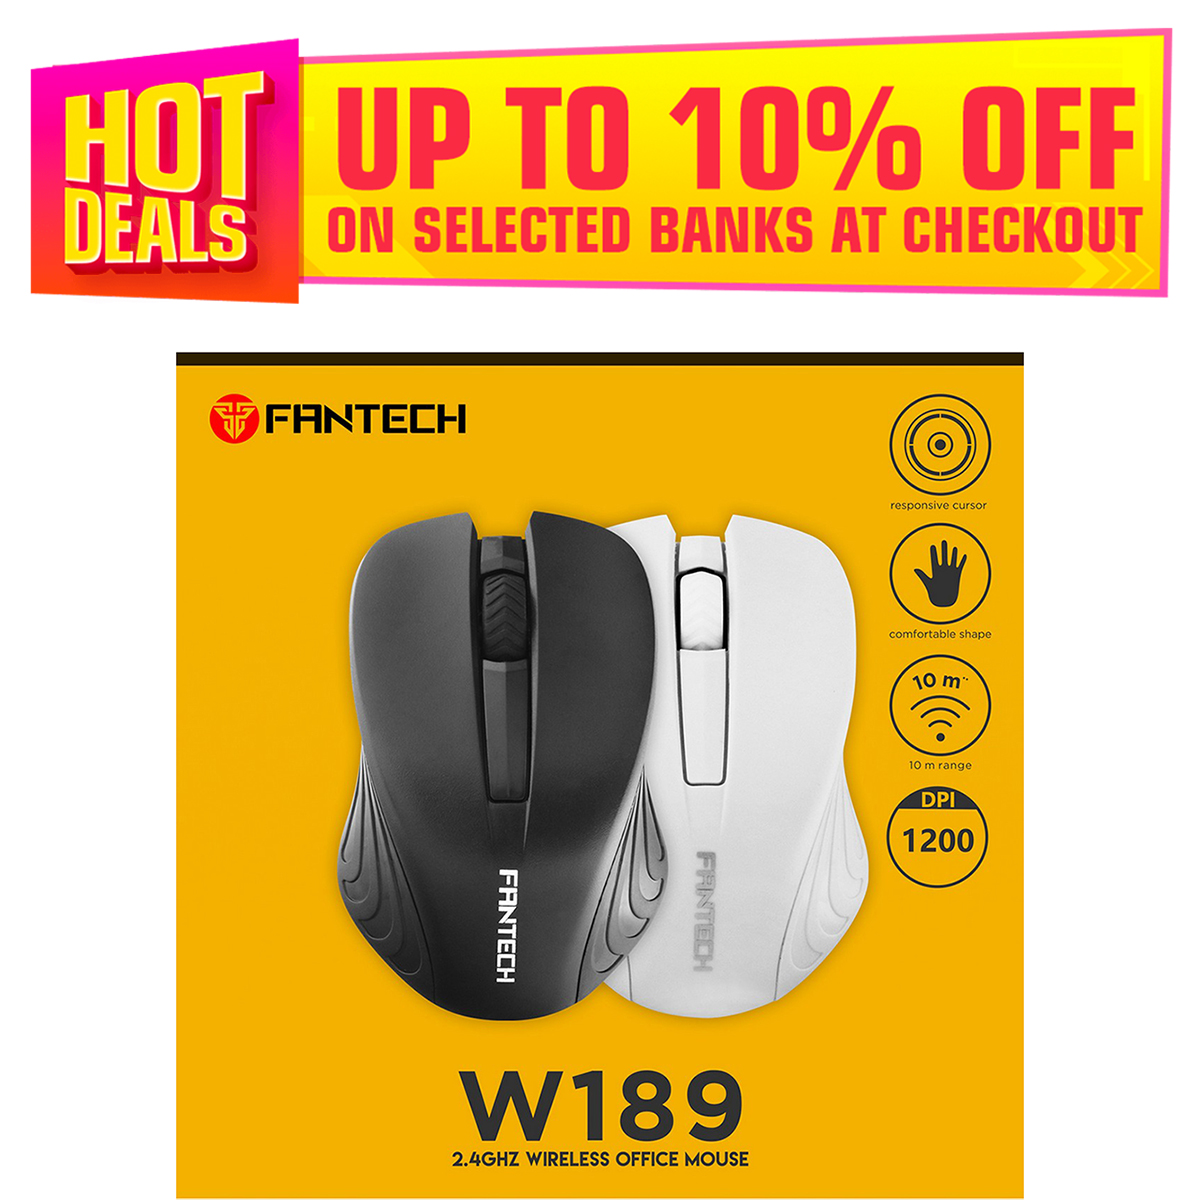 FANTECH W189 Wireless Office Mouse 1200 DPI 10M Range Comfortable Ergonomic With Responsive Cursor For Pc Laptop